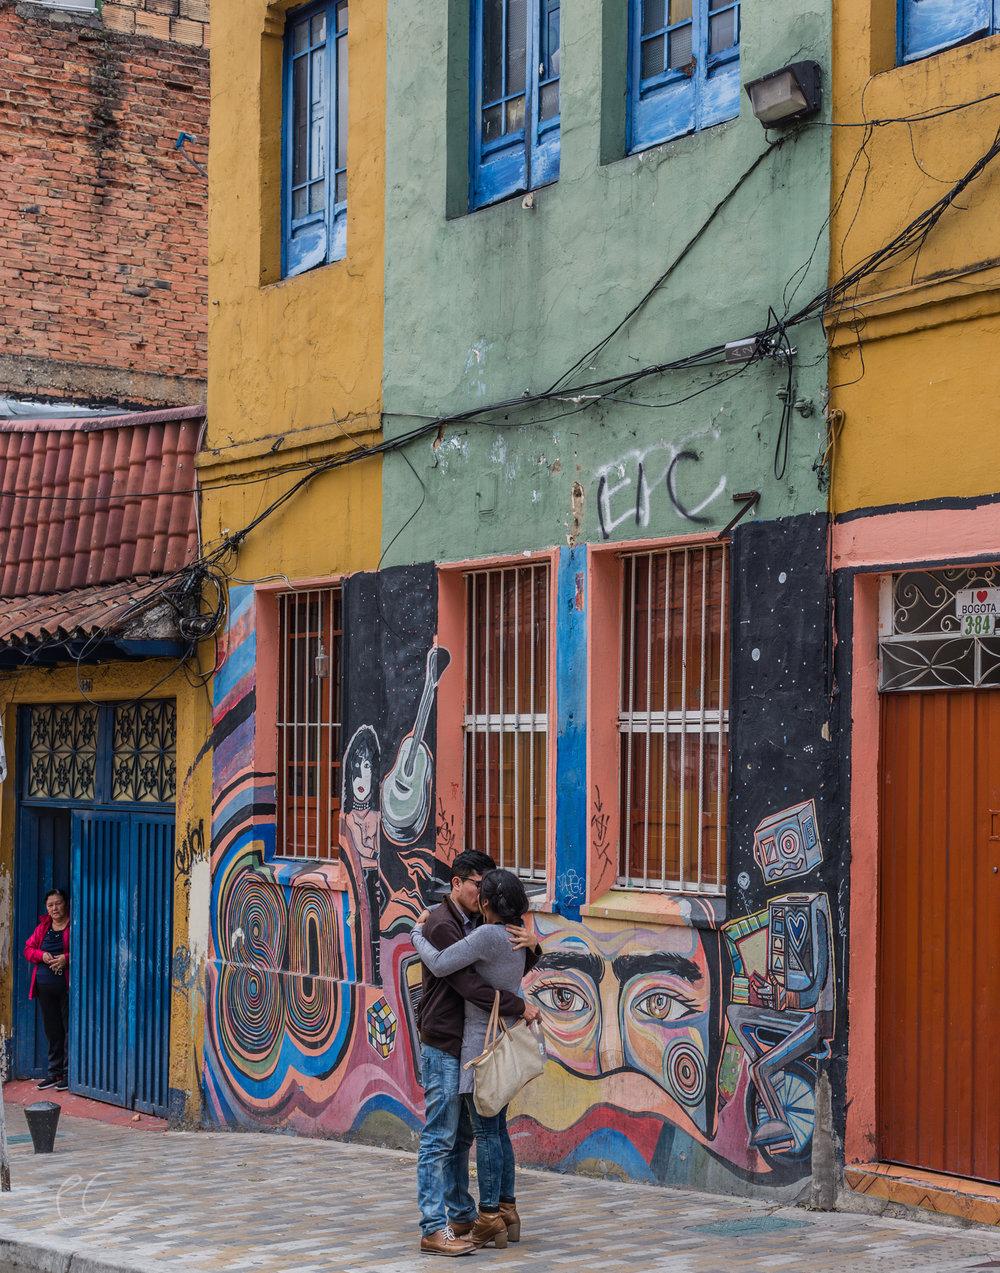 17Dec_Colombia_896-2-2.jpg